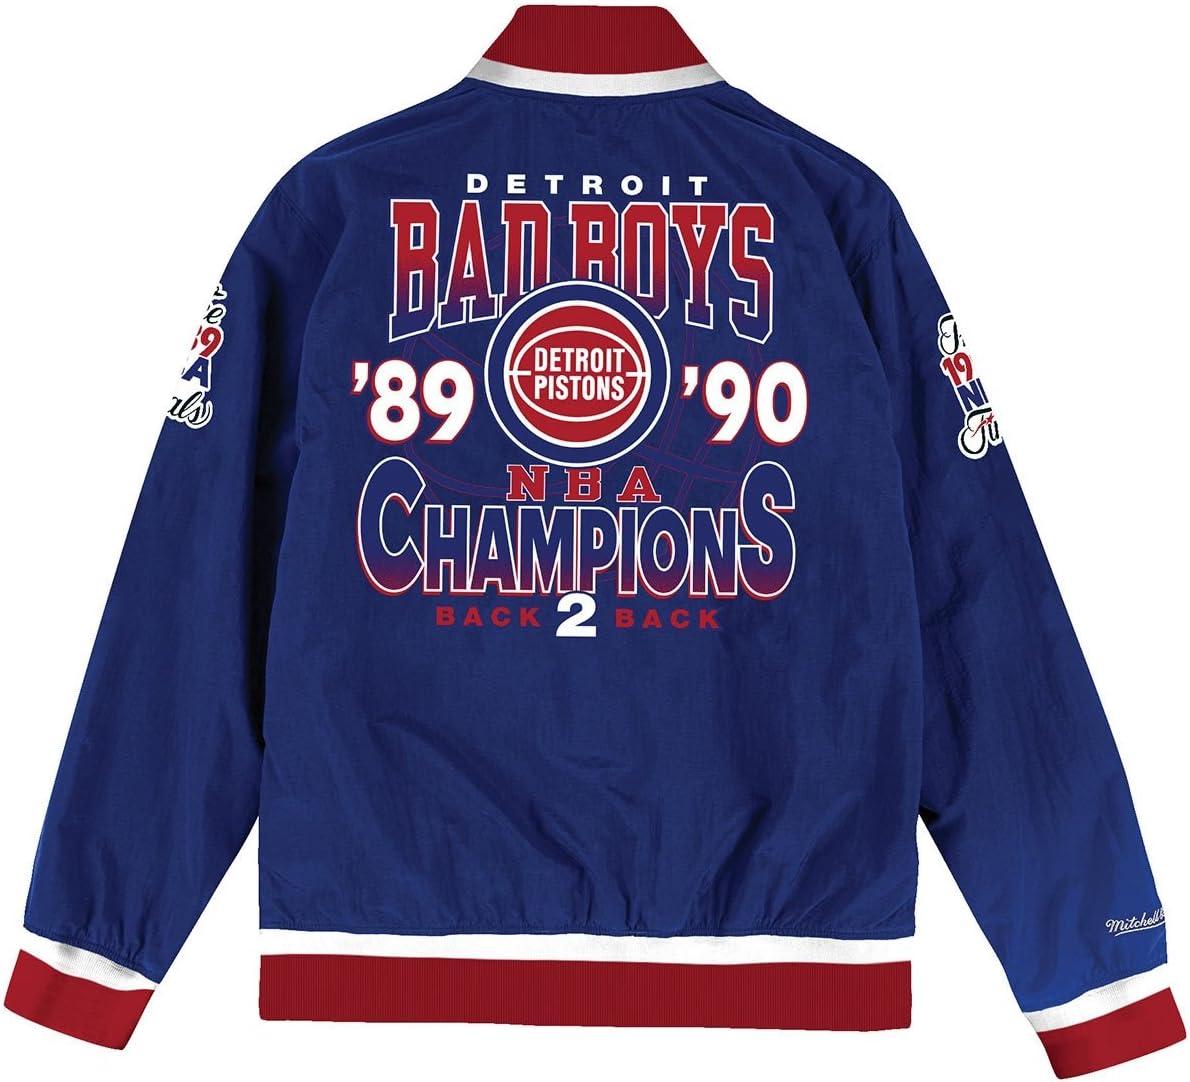 Mitchell /& Ness Detroit Pistons Team History Warm Up Jacket Blue